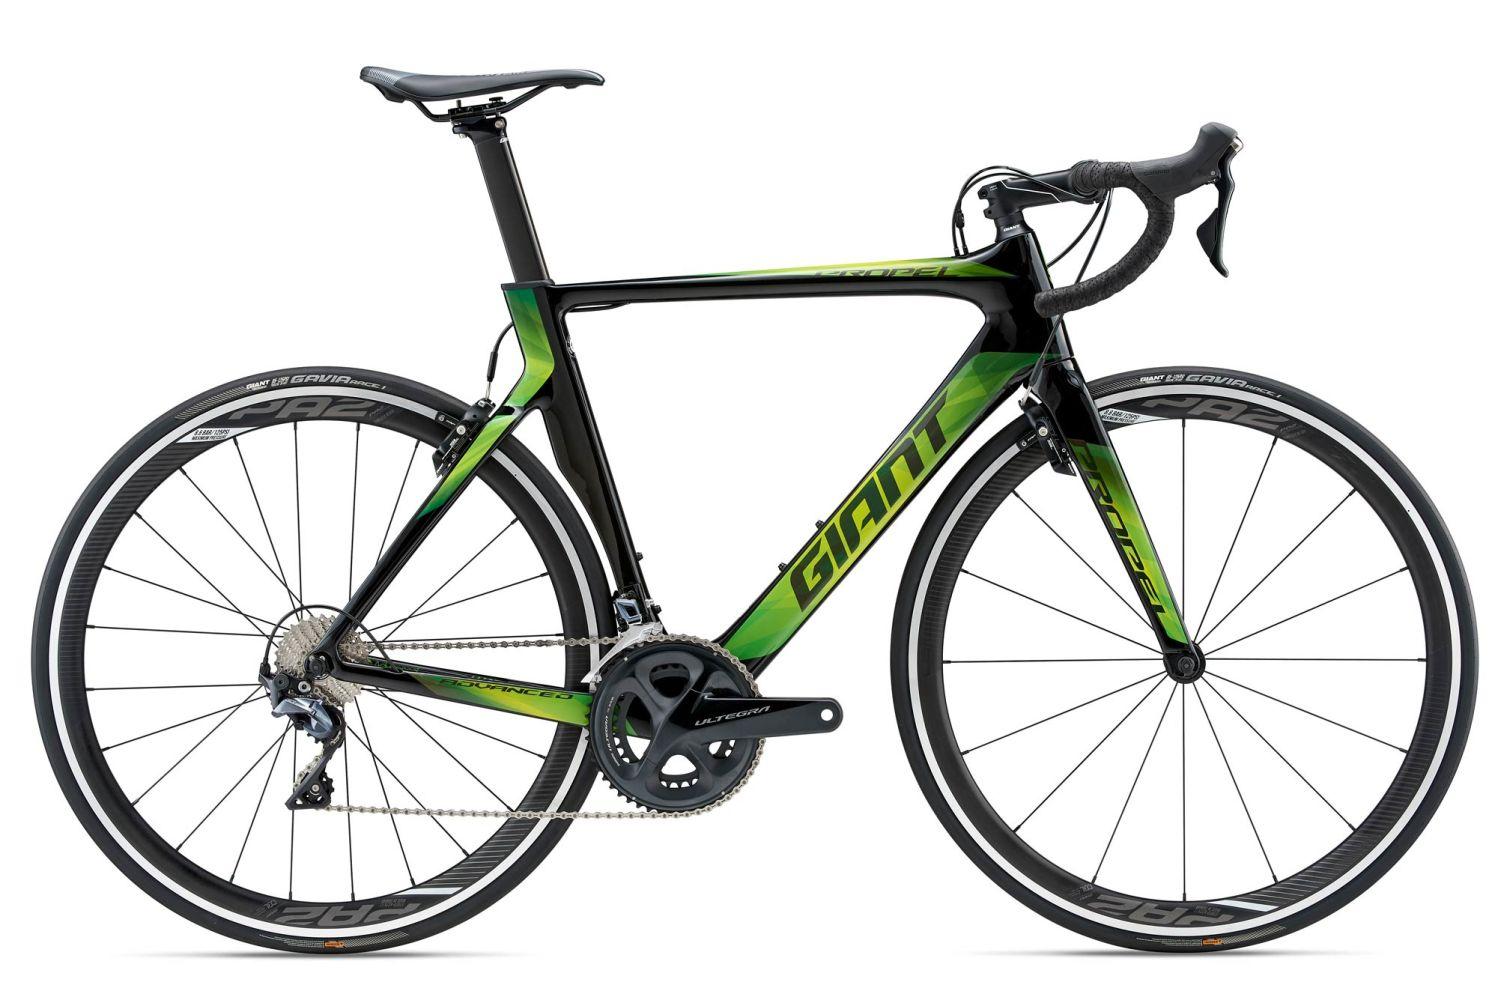 Vélo Route Giant Propel Advanced 1 2018 Carbon - Ultegra R8000 (rutlandcycling.com)